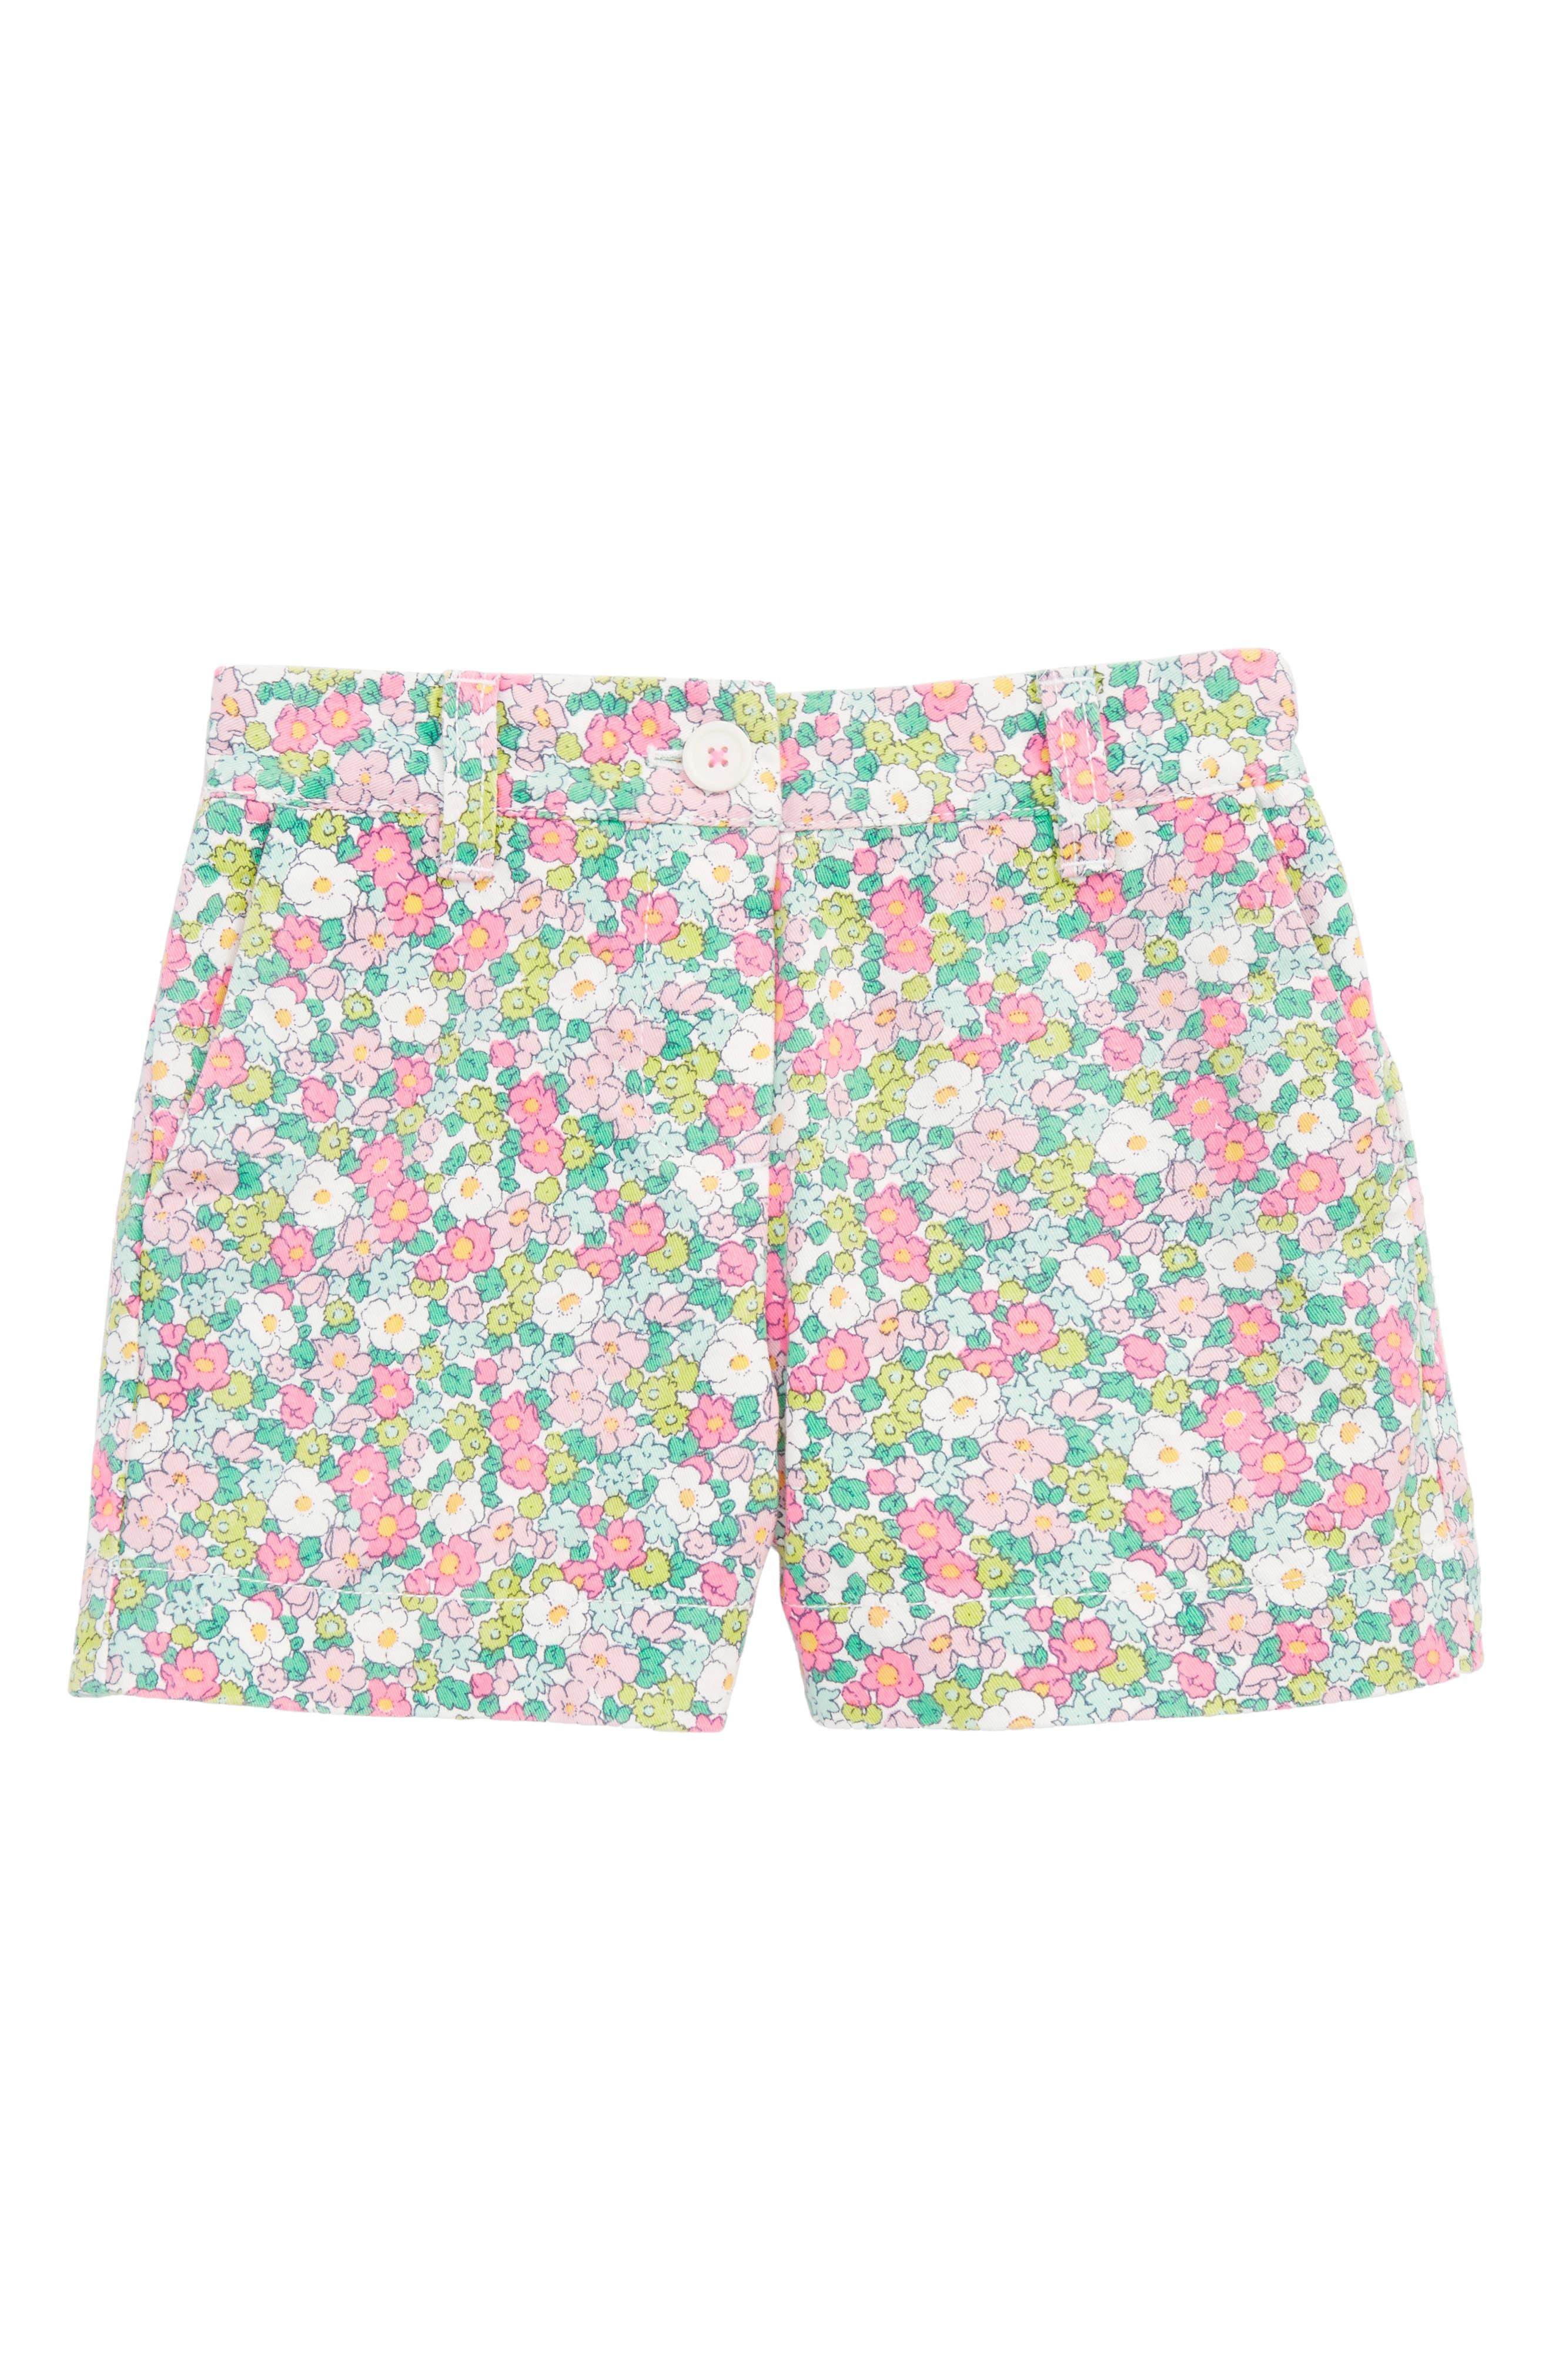 Bright Adventure Shorts,                         Main,                         color, Knockout Pink Vintage Floral